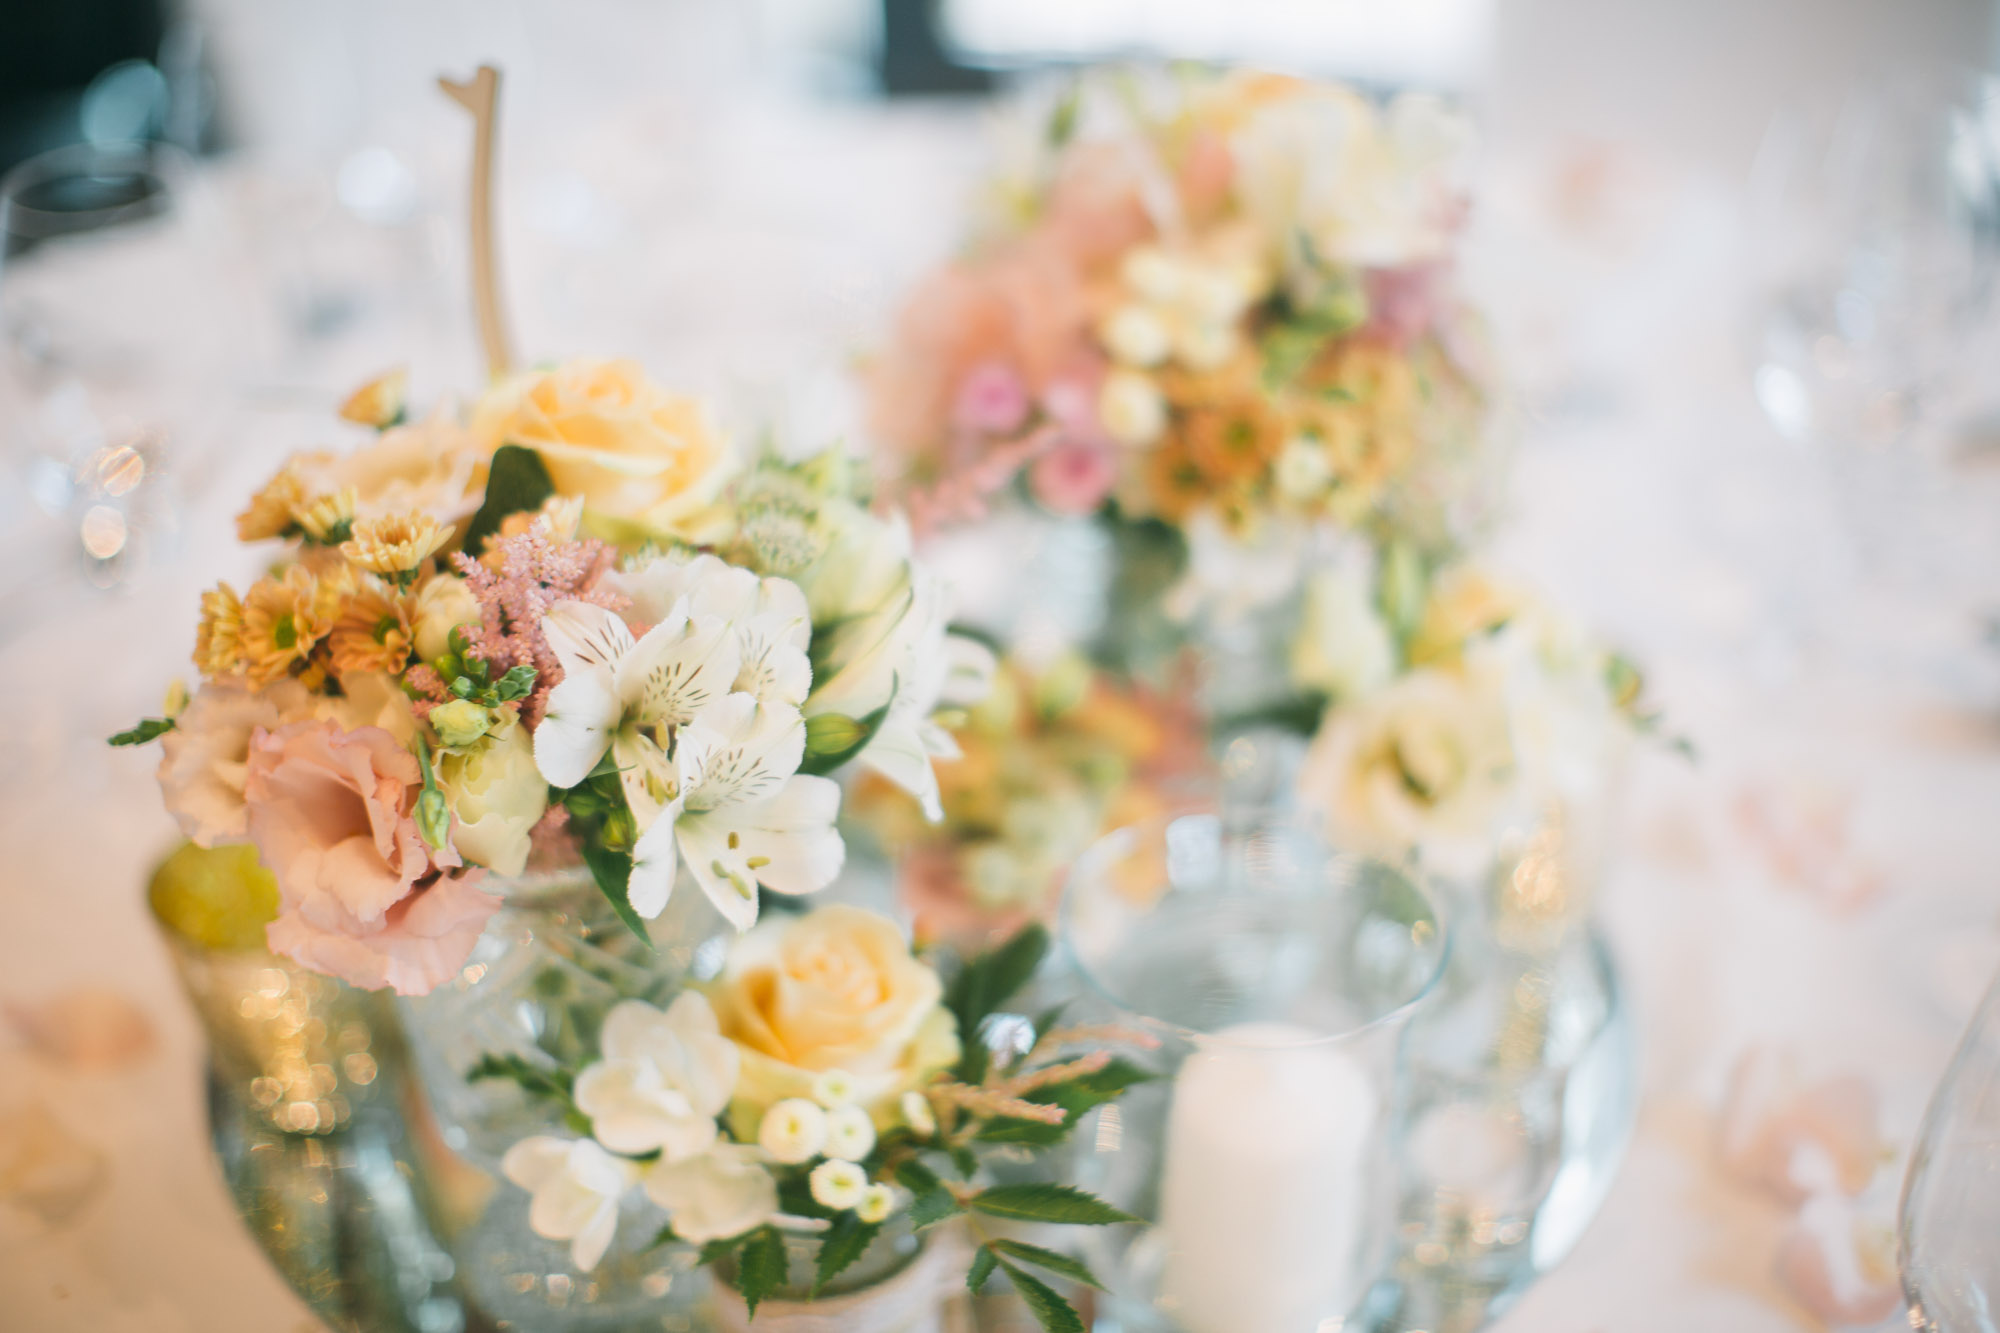 dreamotions | Hochzeitsplanung